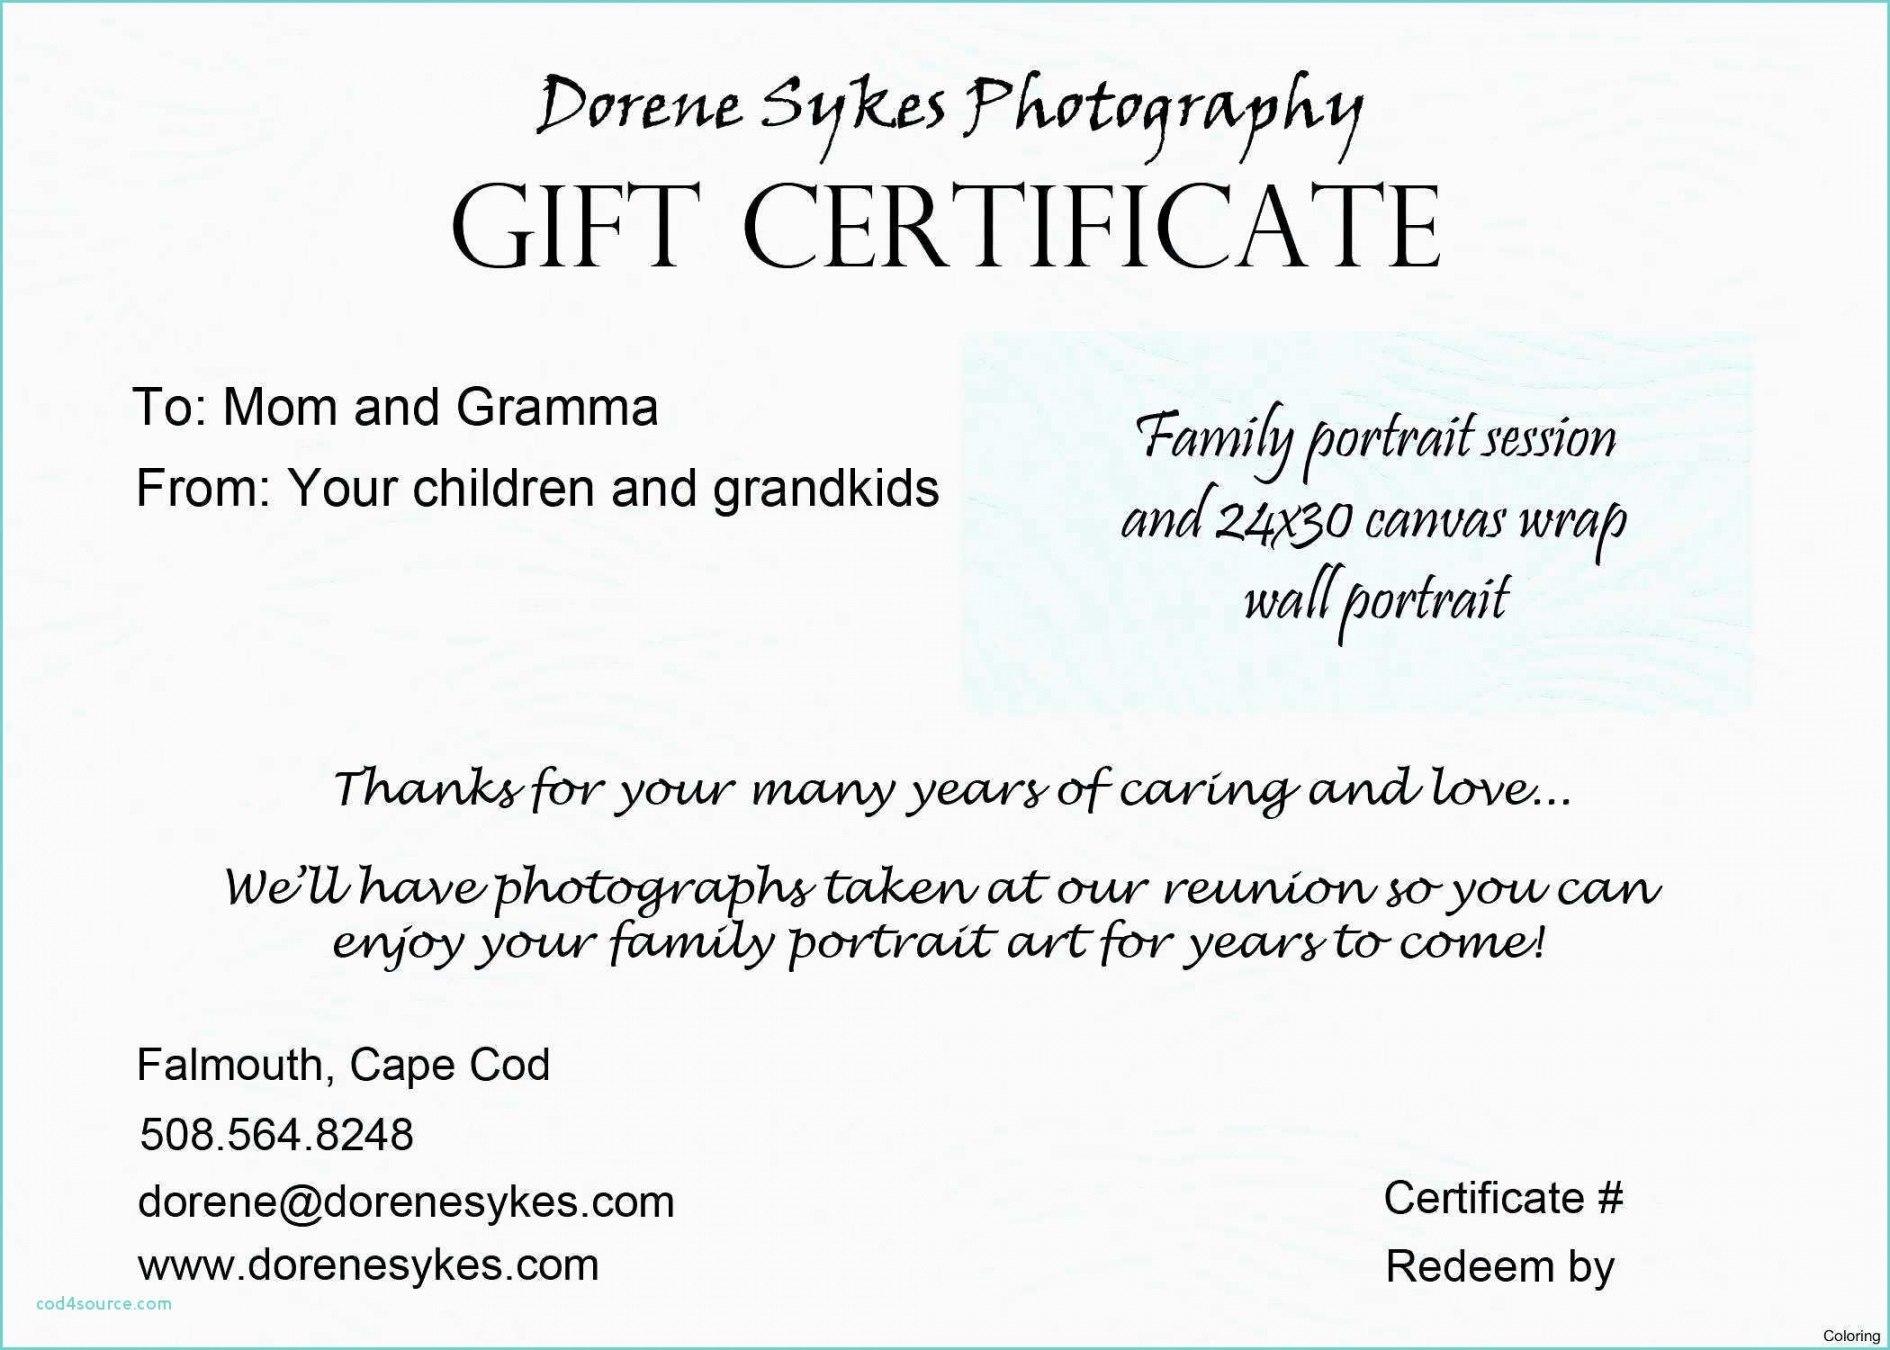 Tattoo Gift Certificate Template Free  Emetonlineblog Intended For Tattoo Gift Certificate Template